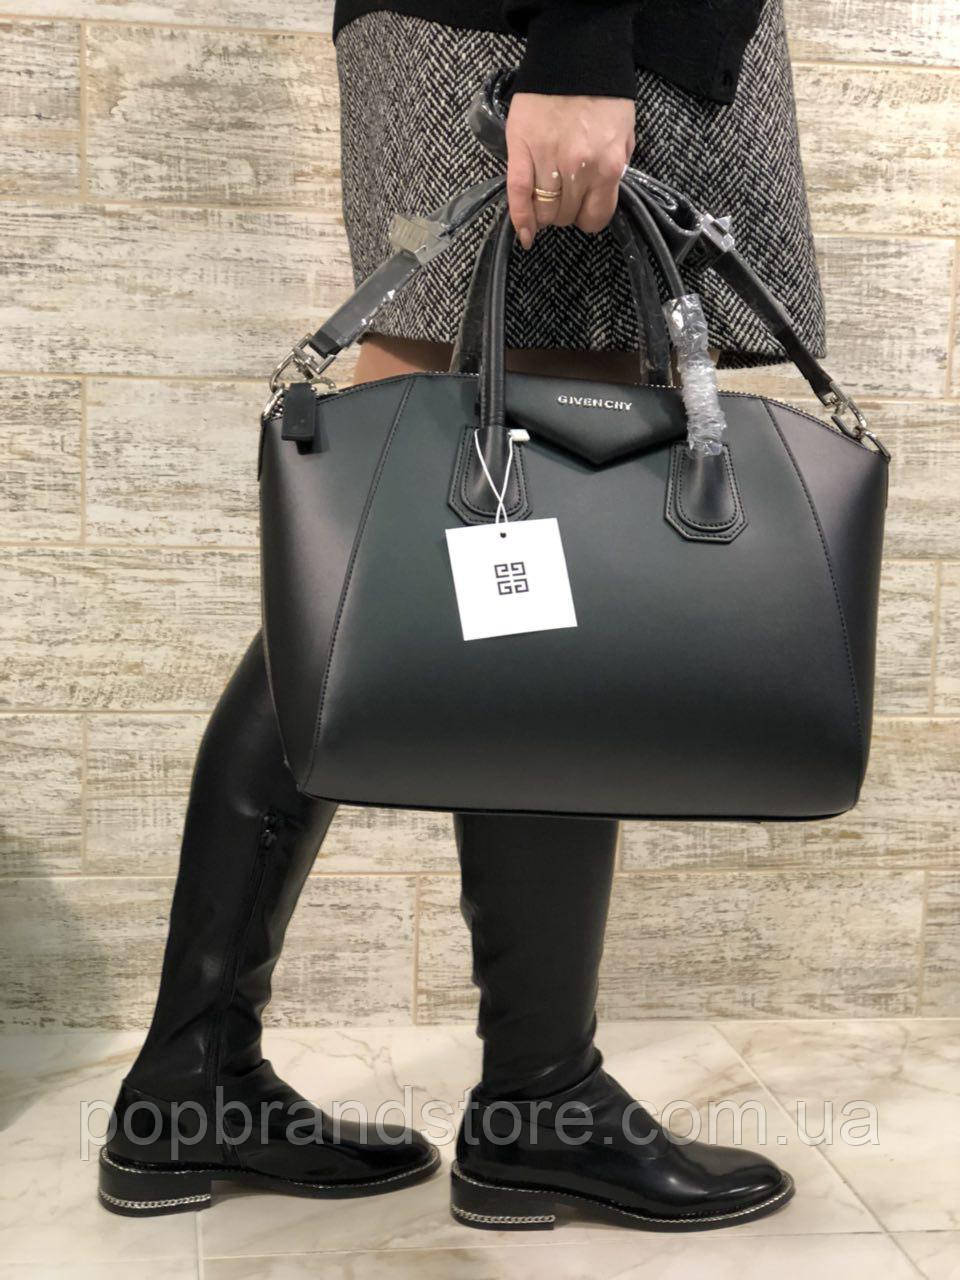 f6efd23dac18 Сумка GIVENCHY ANTIGONA гладкая кожа (реплика) - Pop Brand Store |  брендовые сумки,